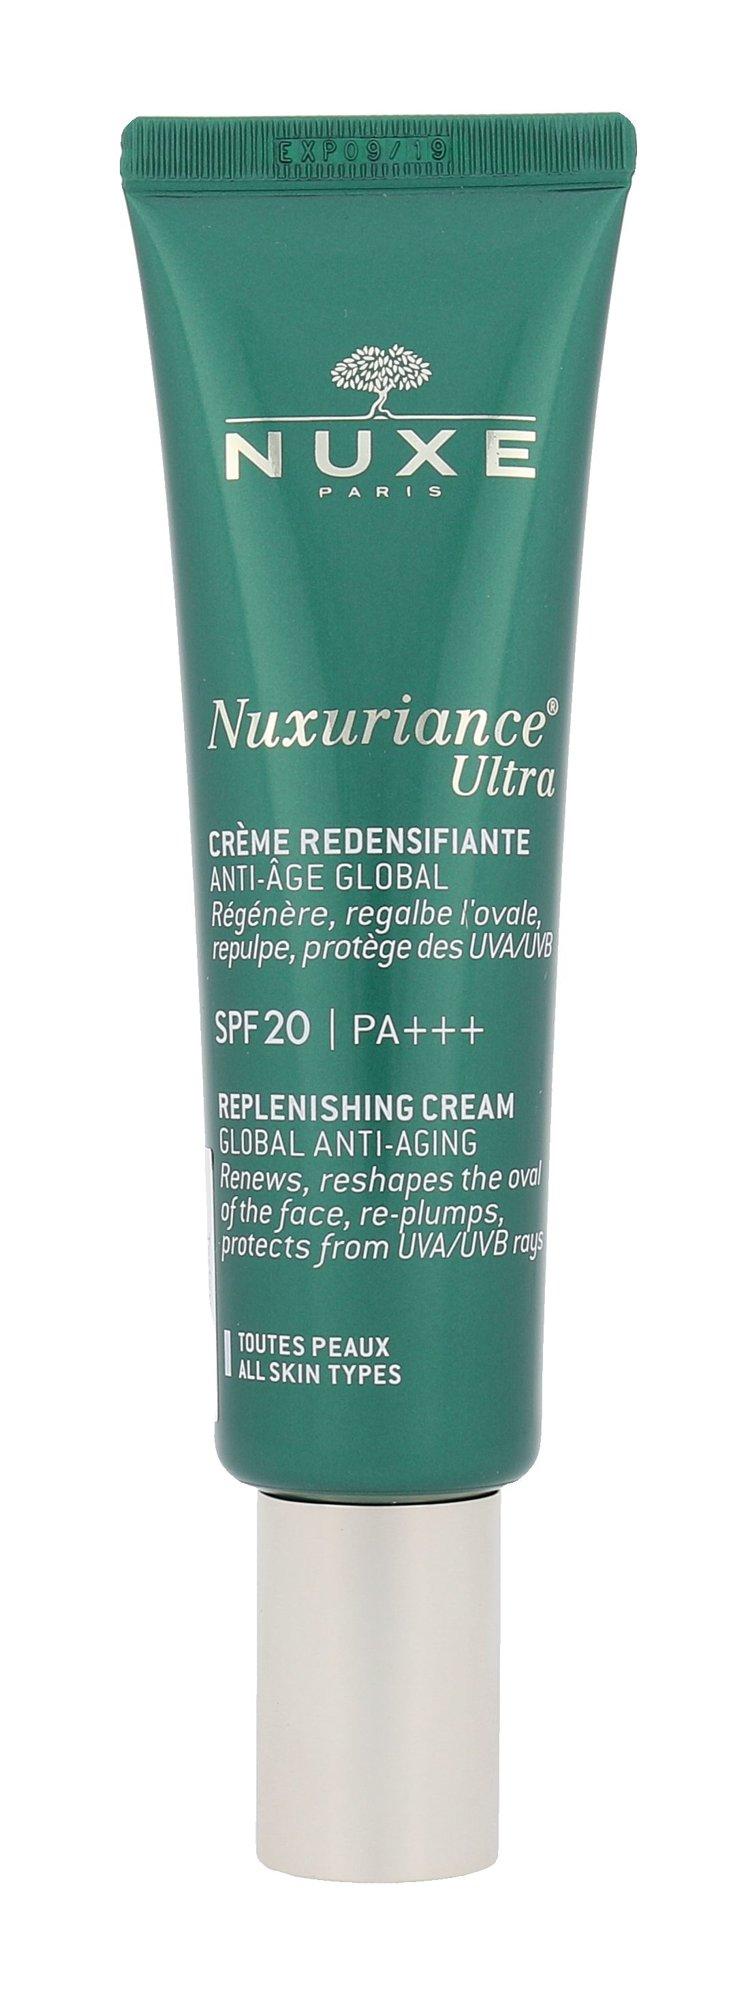 Nuxe Nuxuriance Ultra Replenishing Cream SPF20 Cosmetic 50ml